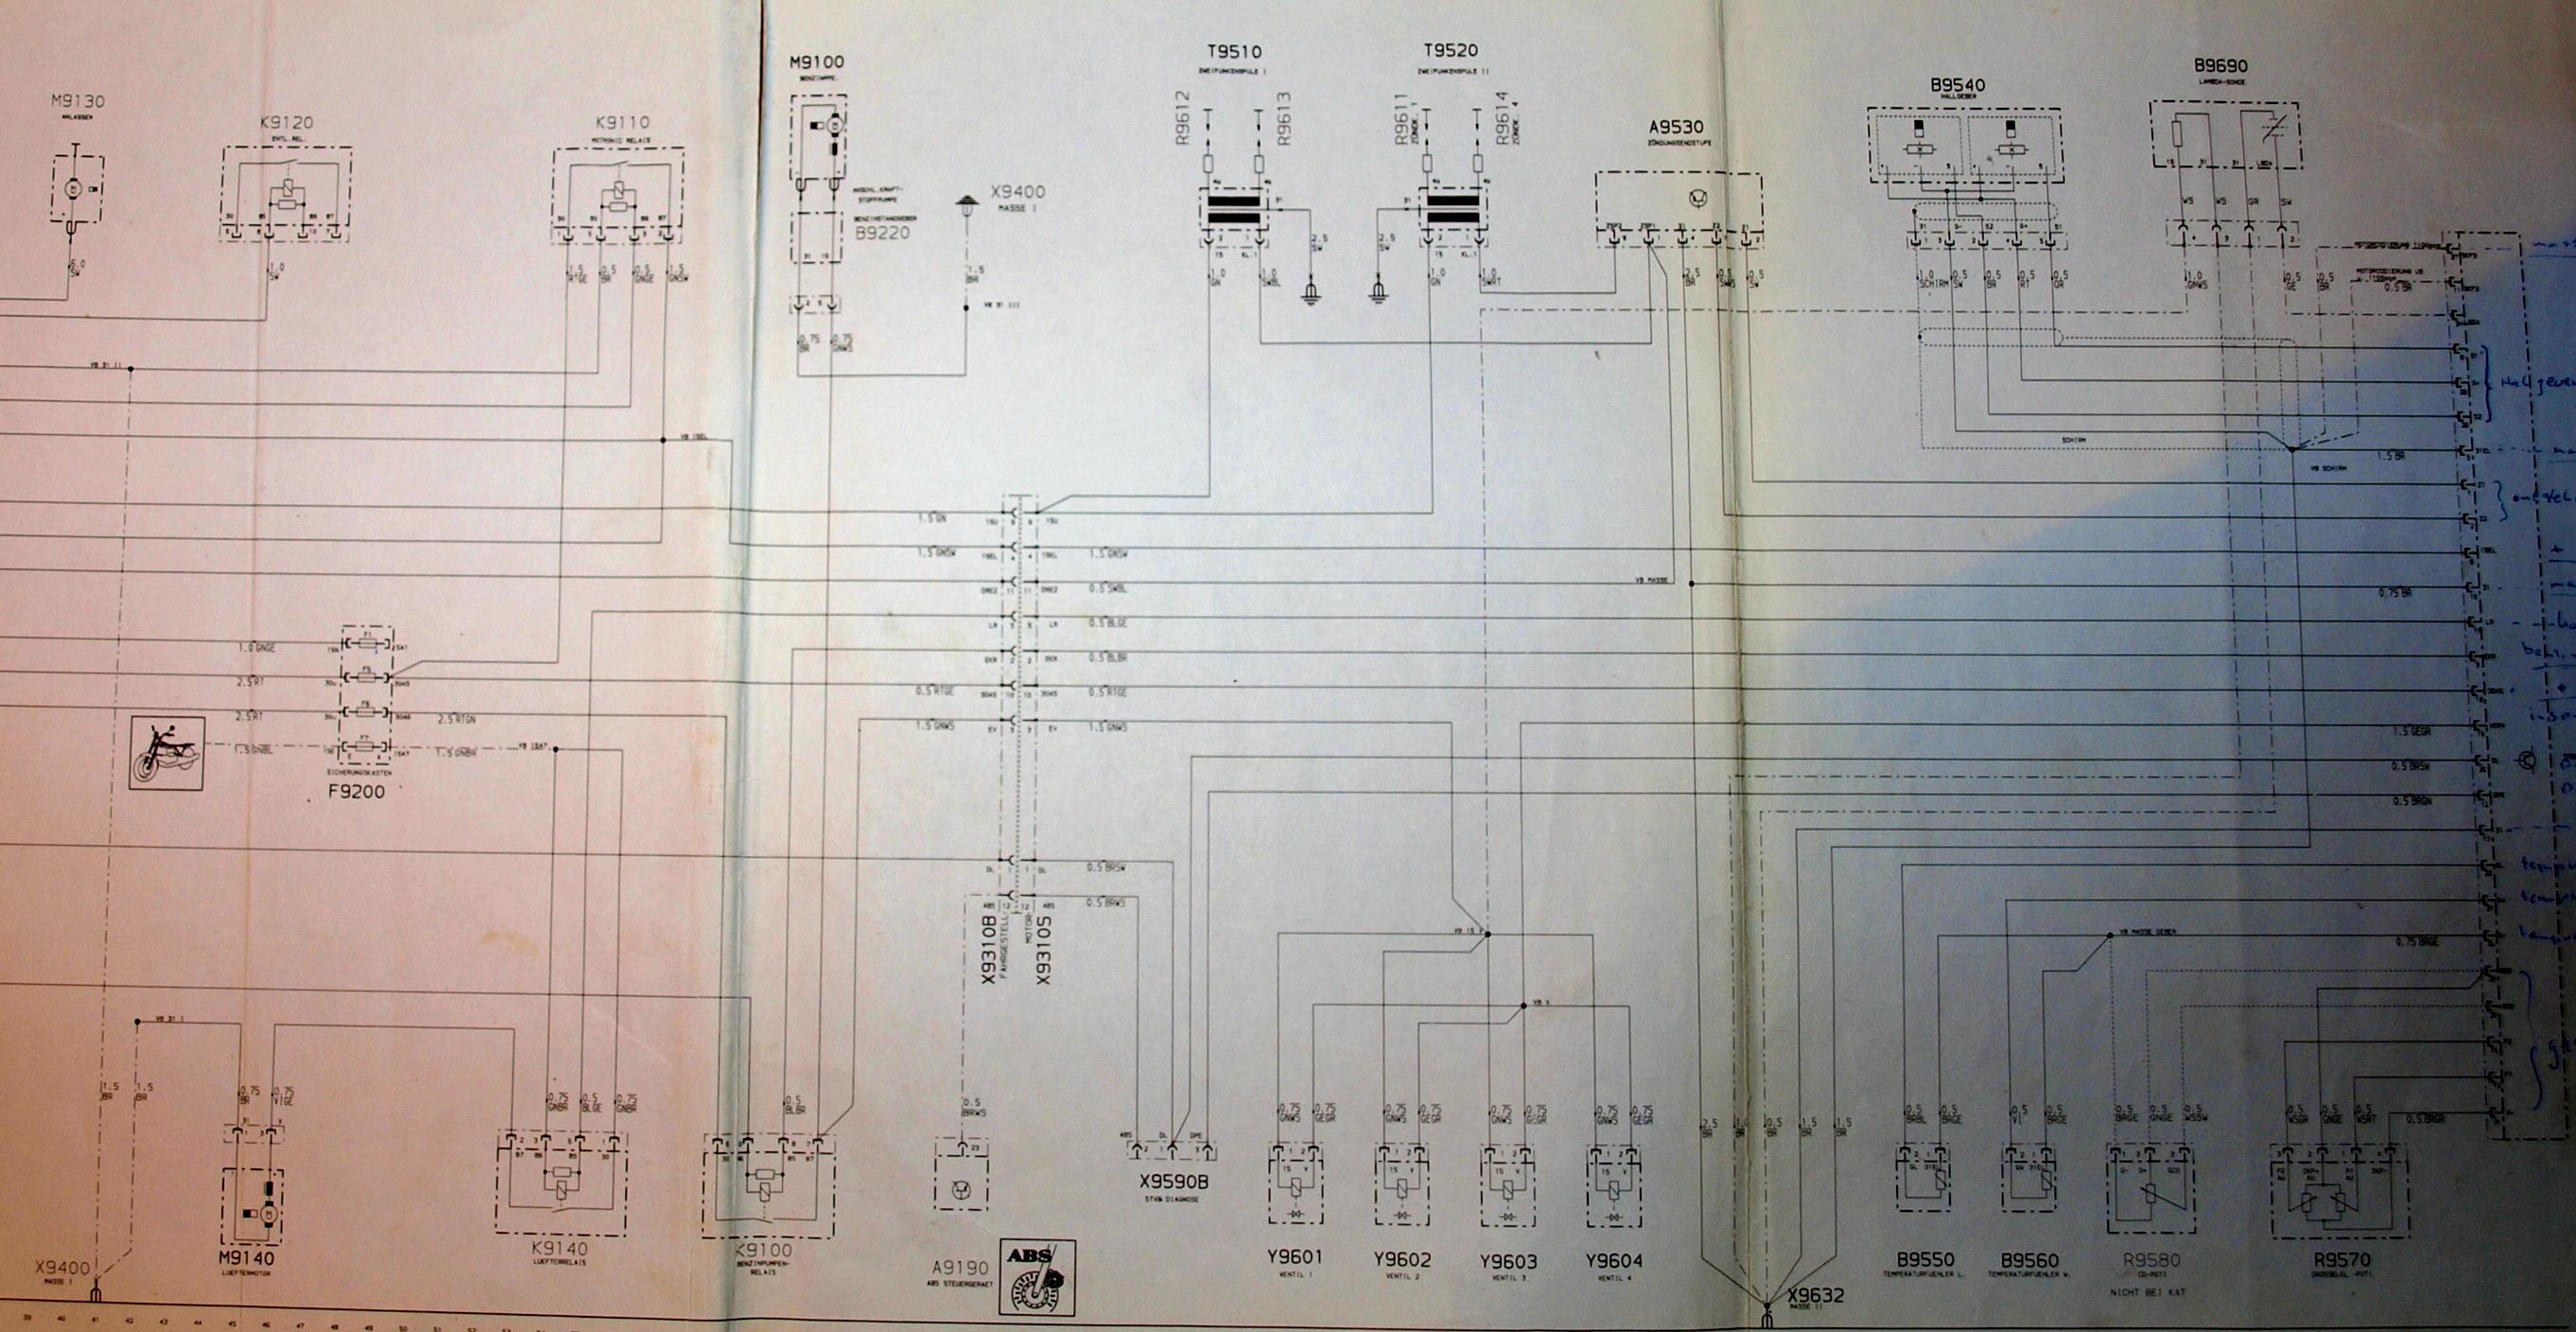 Schema Elettrico K100 : Elektrisch schema van de v modellen k rs en